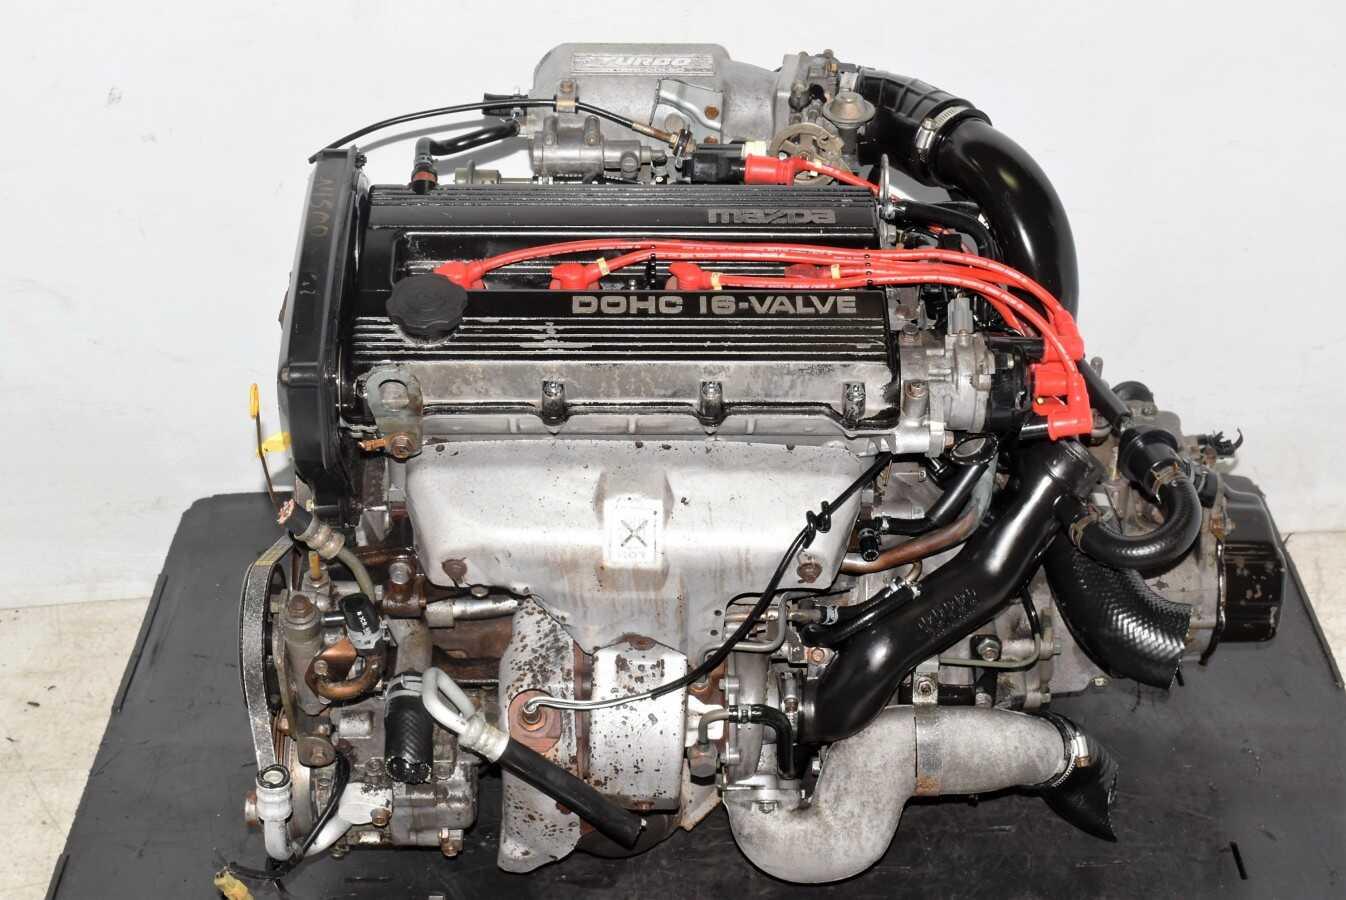 used jdm mazda familia 323 gtx gtr bp turbo engine | | j-spec auto